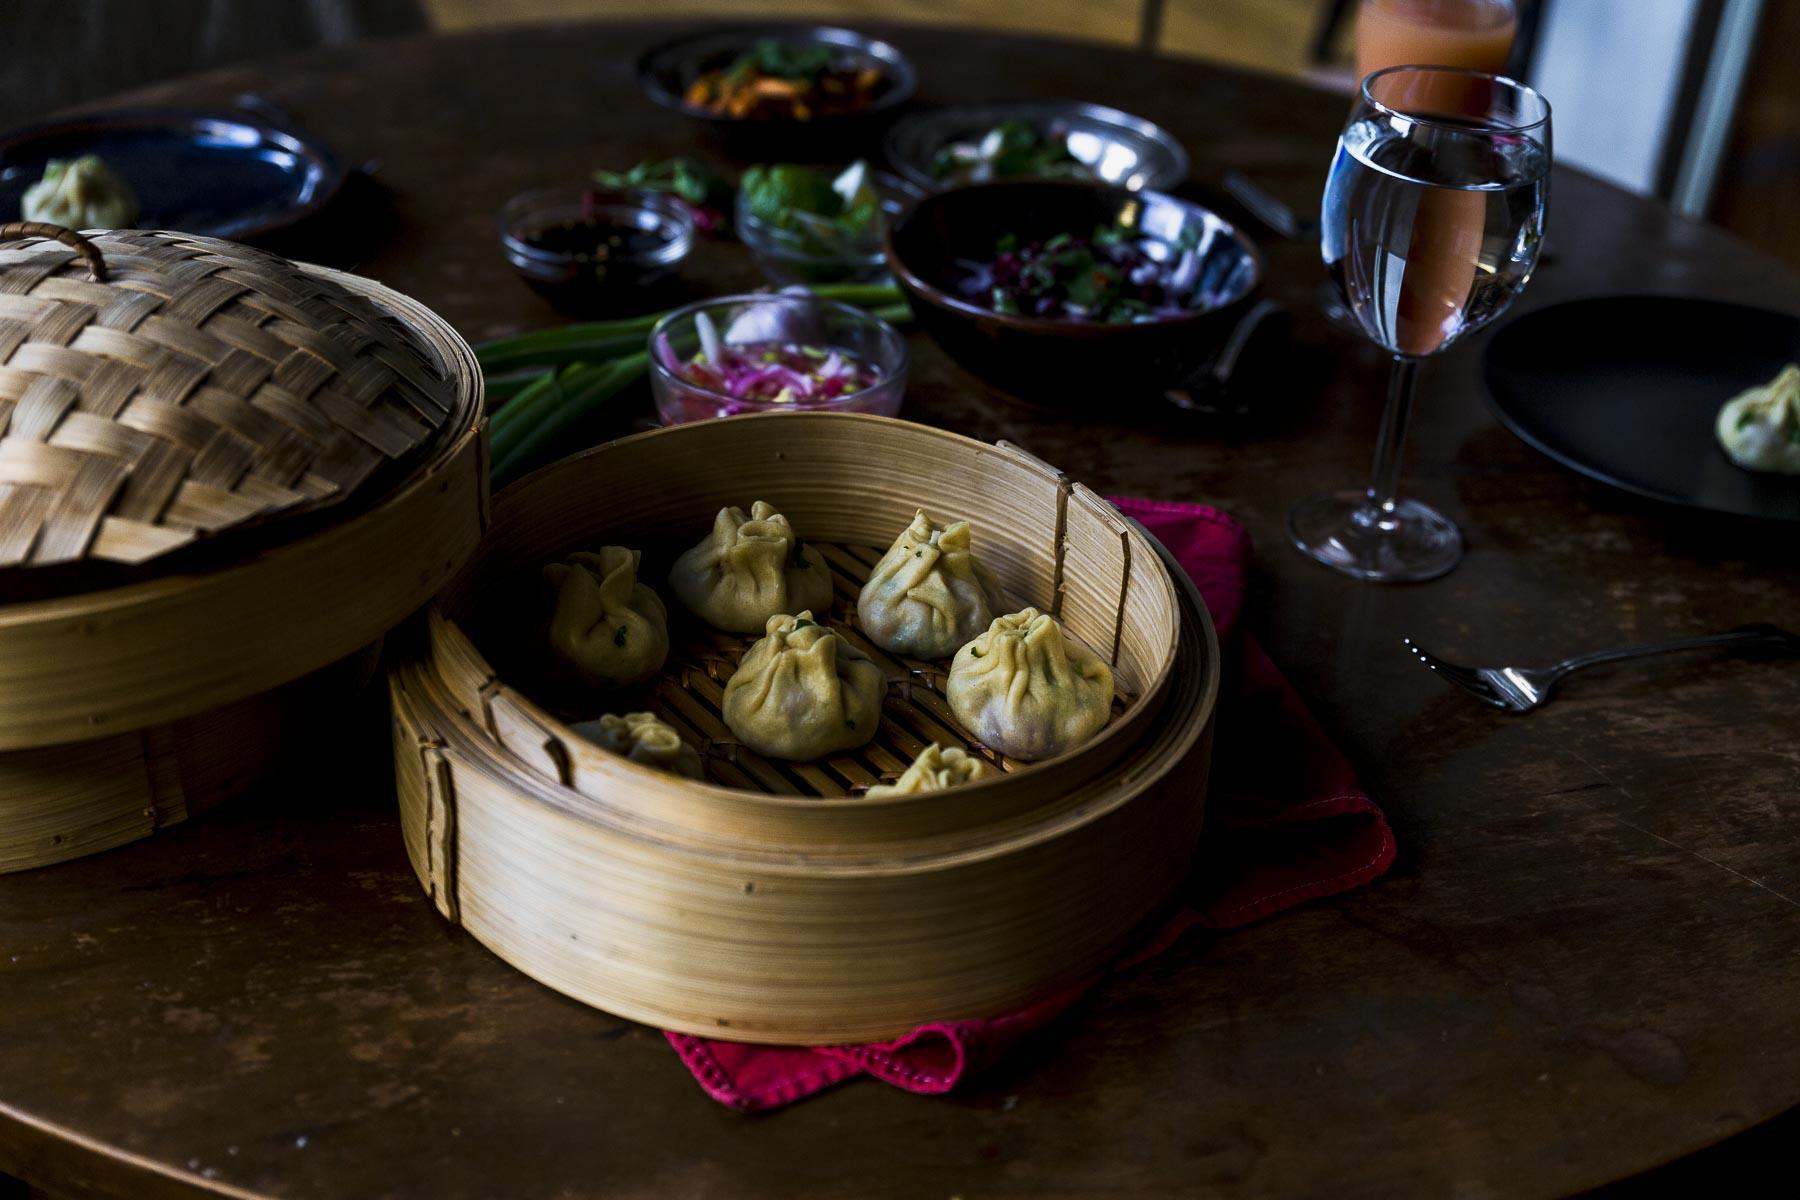 steamed lamb dumplings on the table